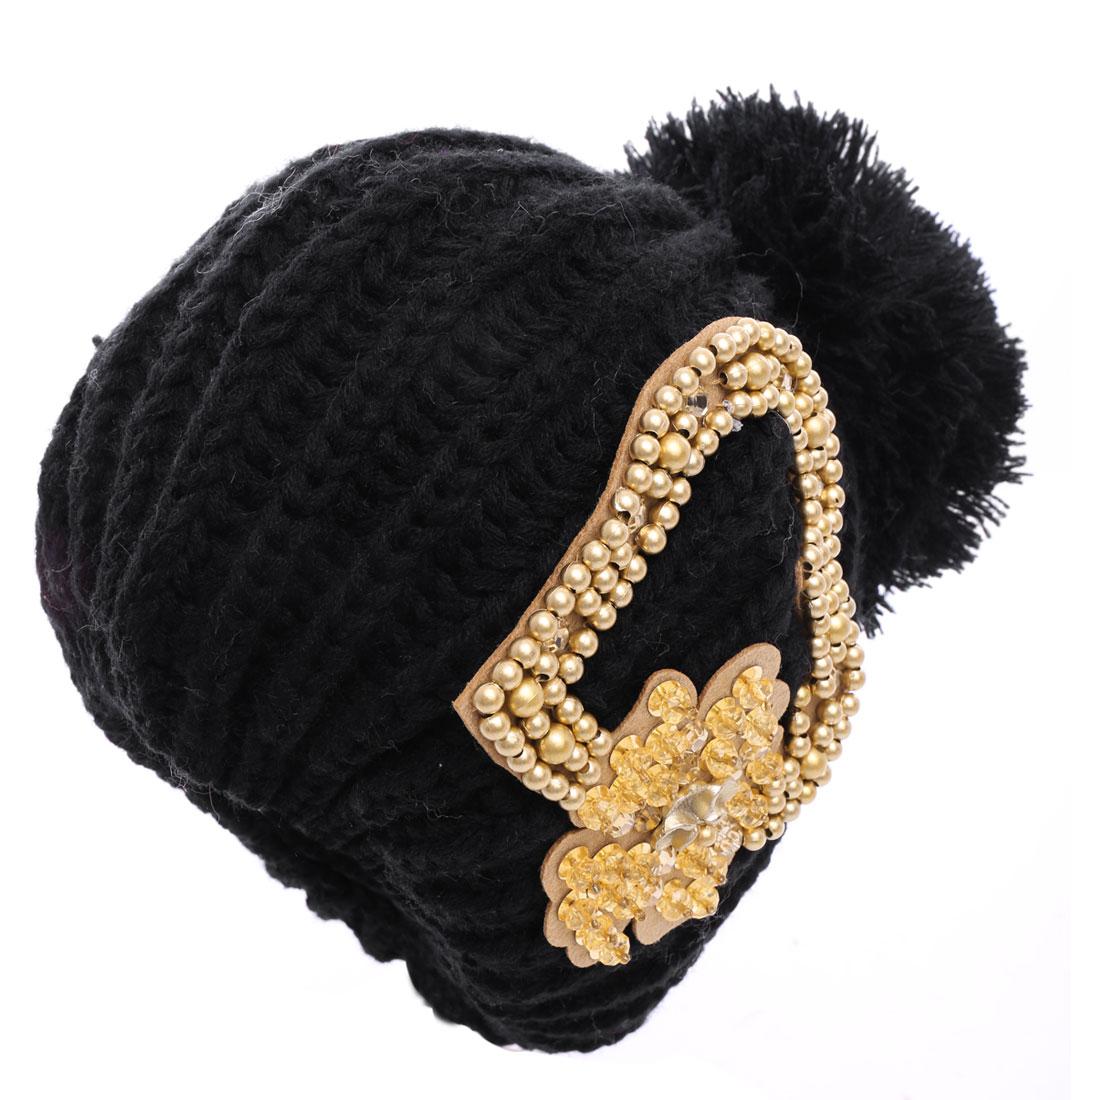 Ladies Braid Pattern Winter Wearing Knitted Beanie Hat Black